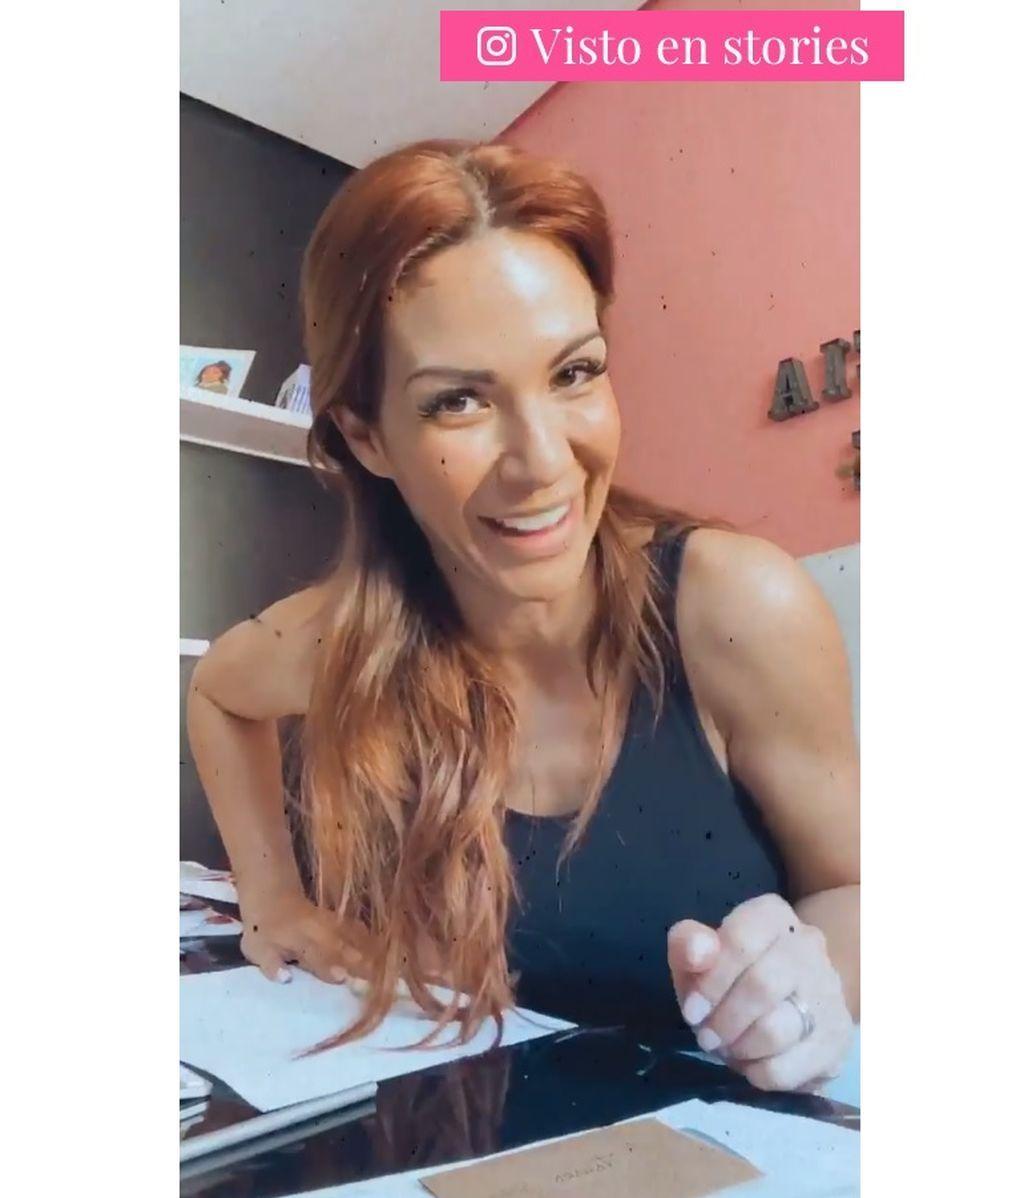 Tamara Gorro aclara si va a volver a ser madre